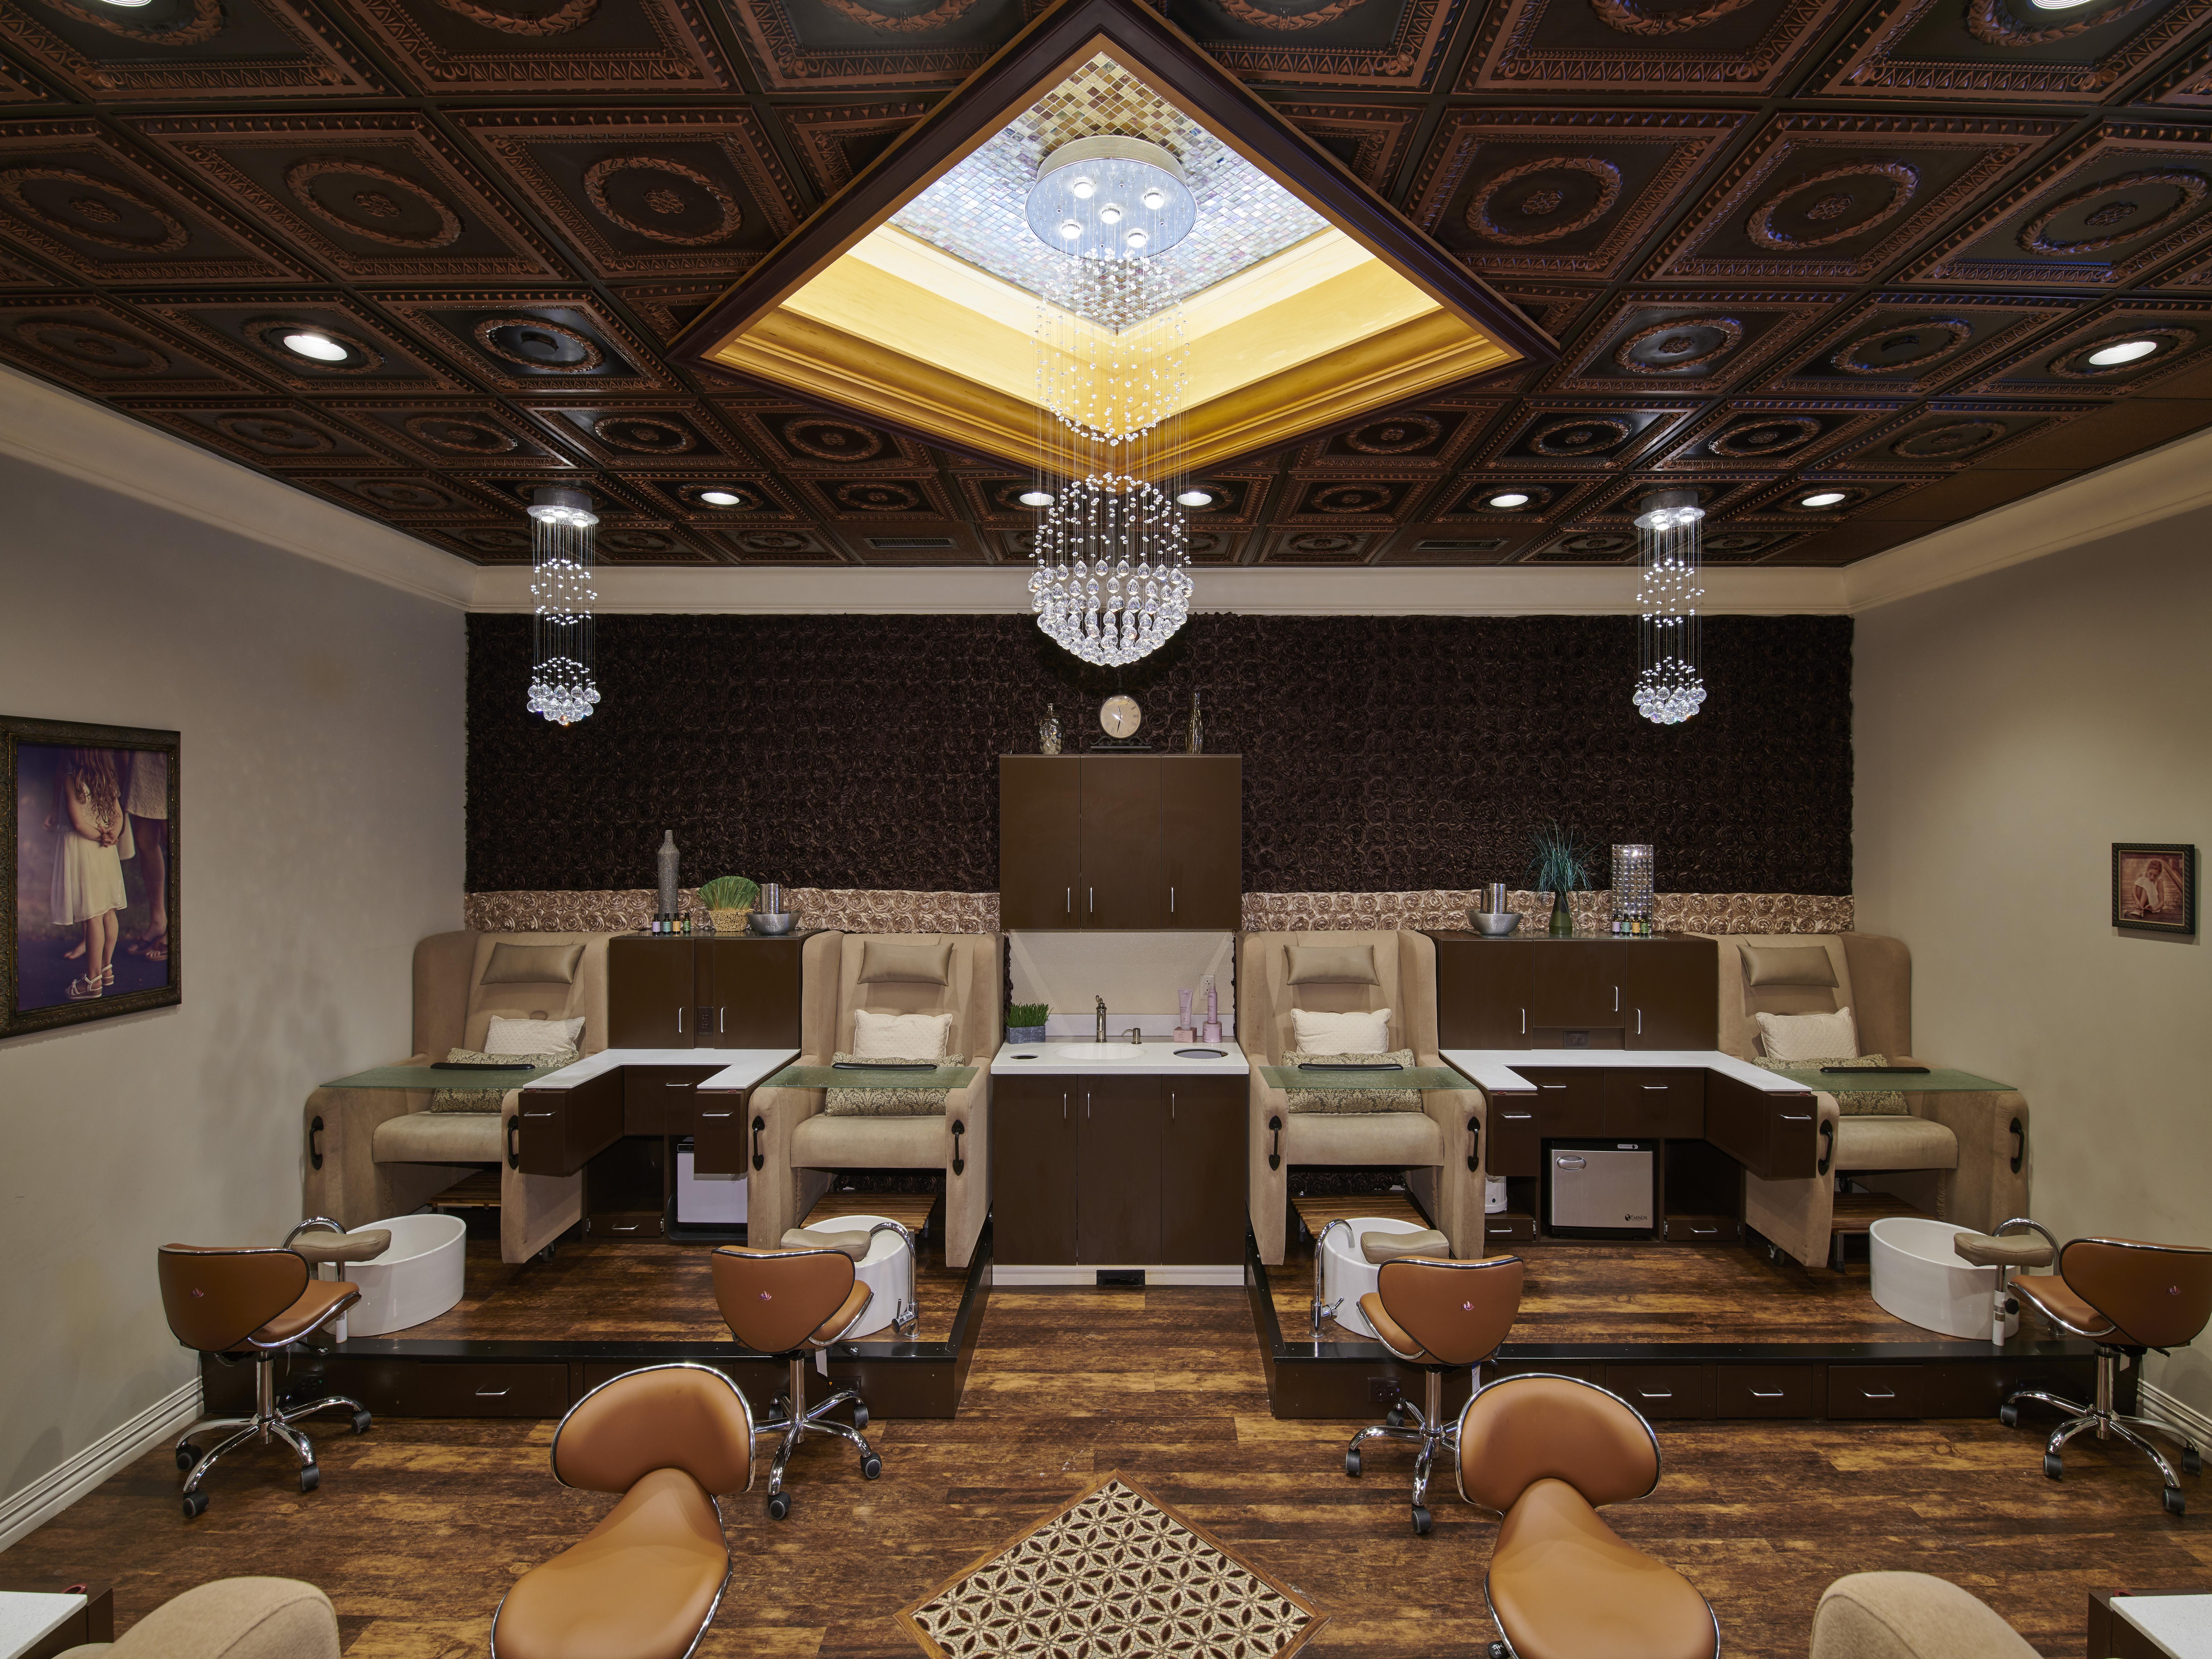 2018 Salons of the Year: Five Senses Spa, Salon & Barbershop